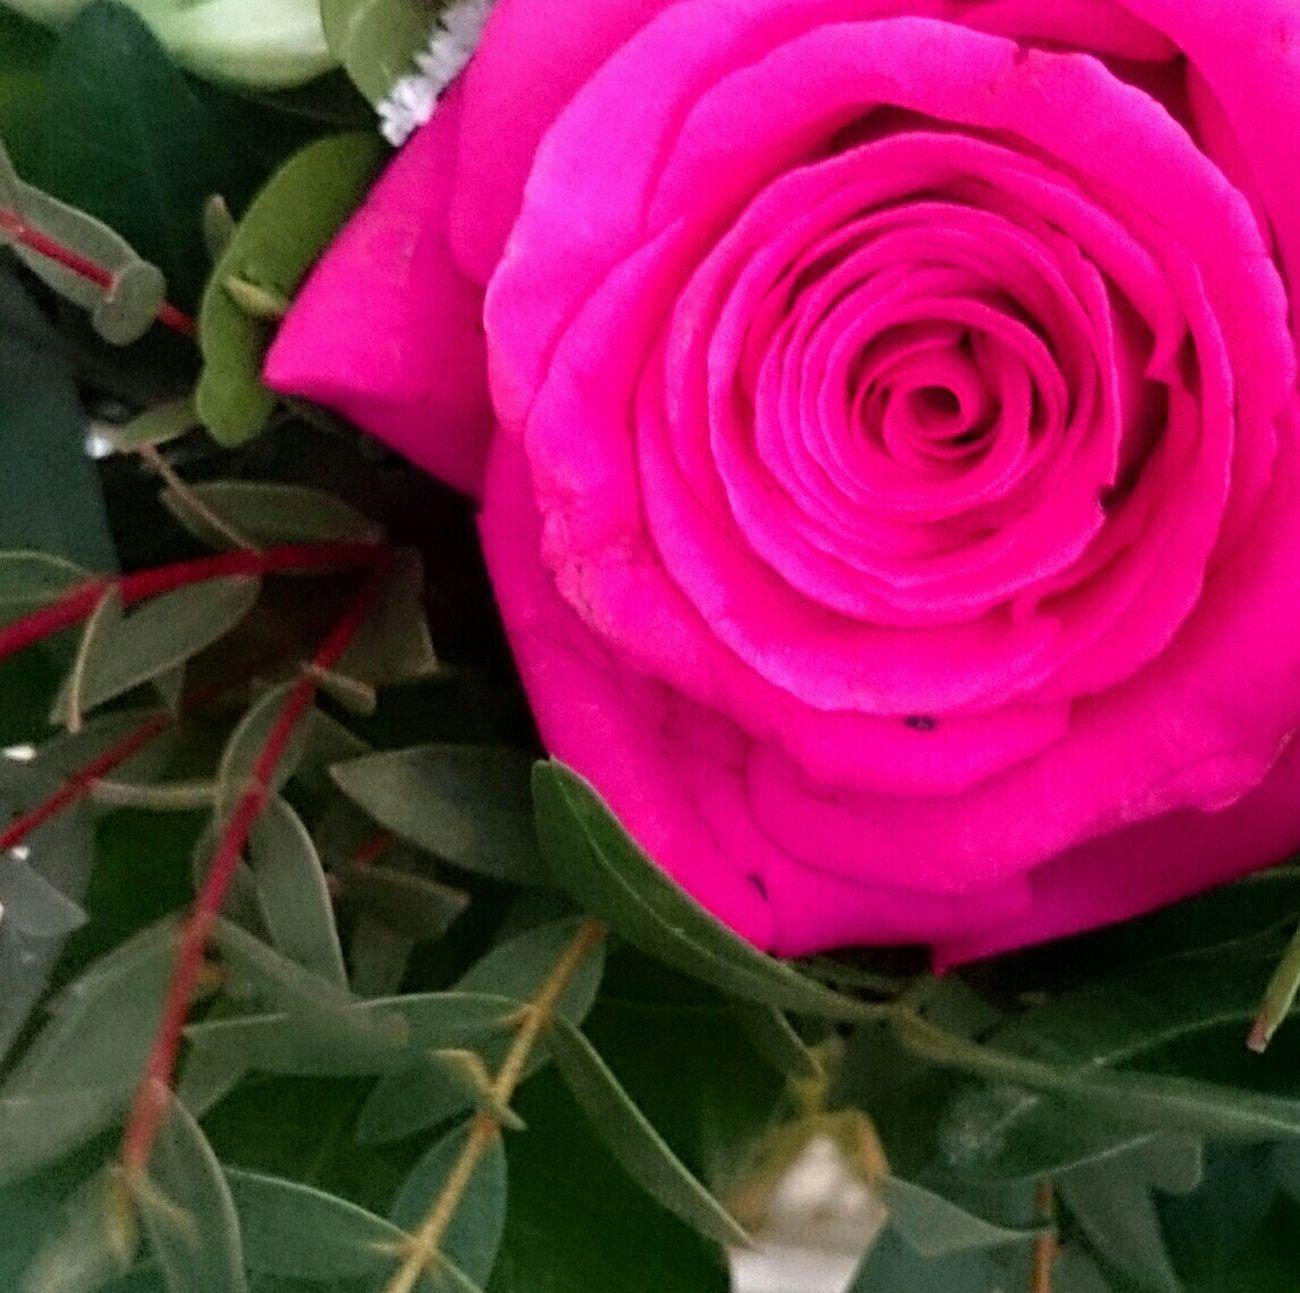 Roses A Rose Pink Pink Rose Pink Flower Flower Flowerporn Flower Collection Spring Spring Flowers